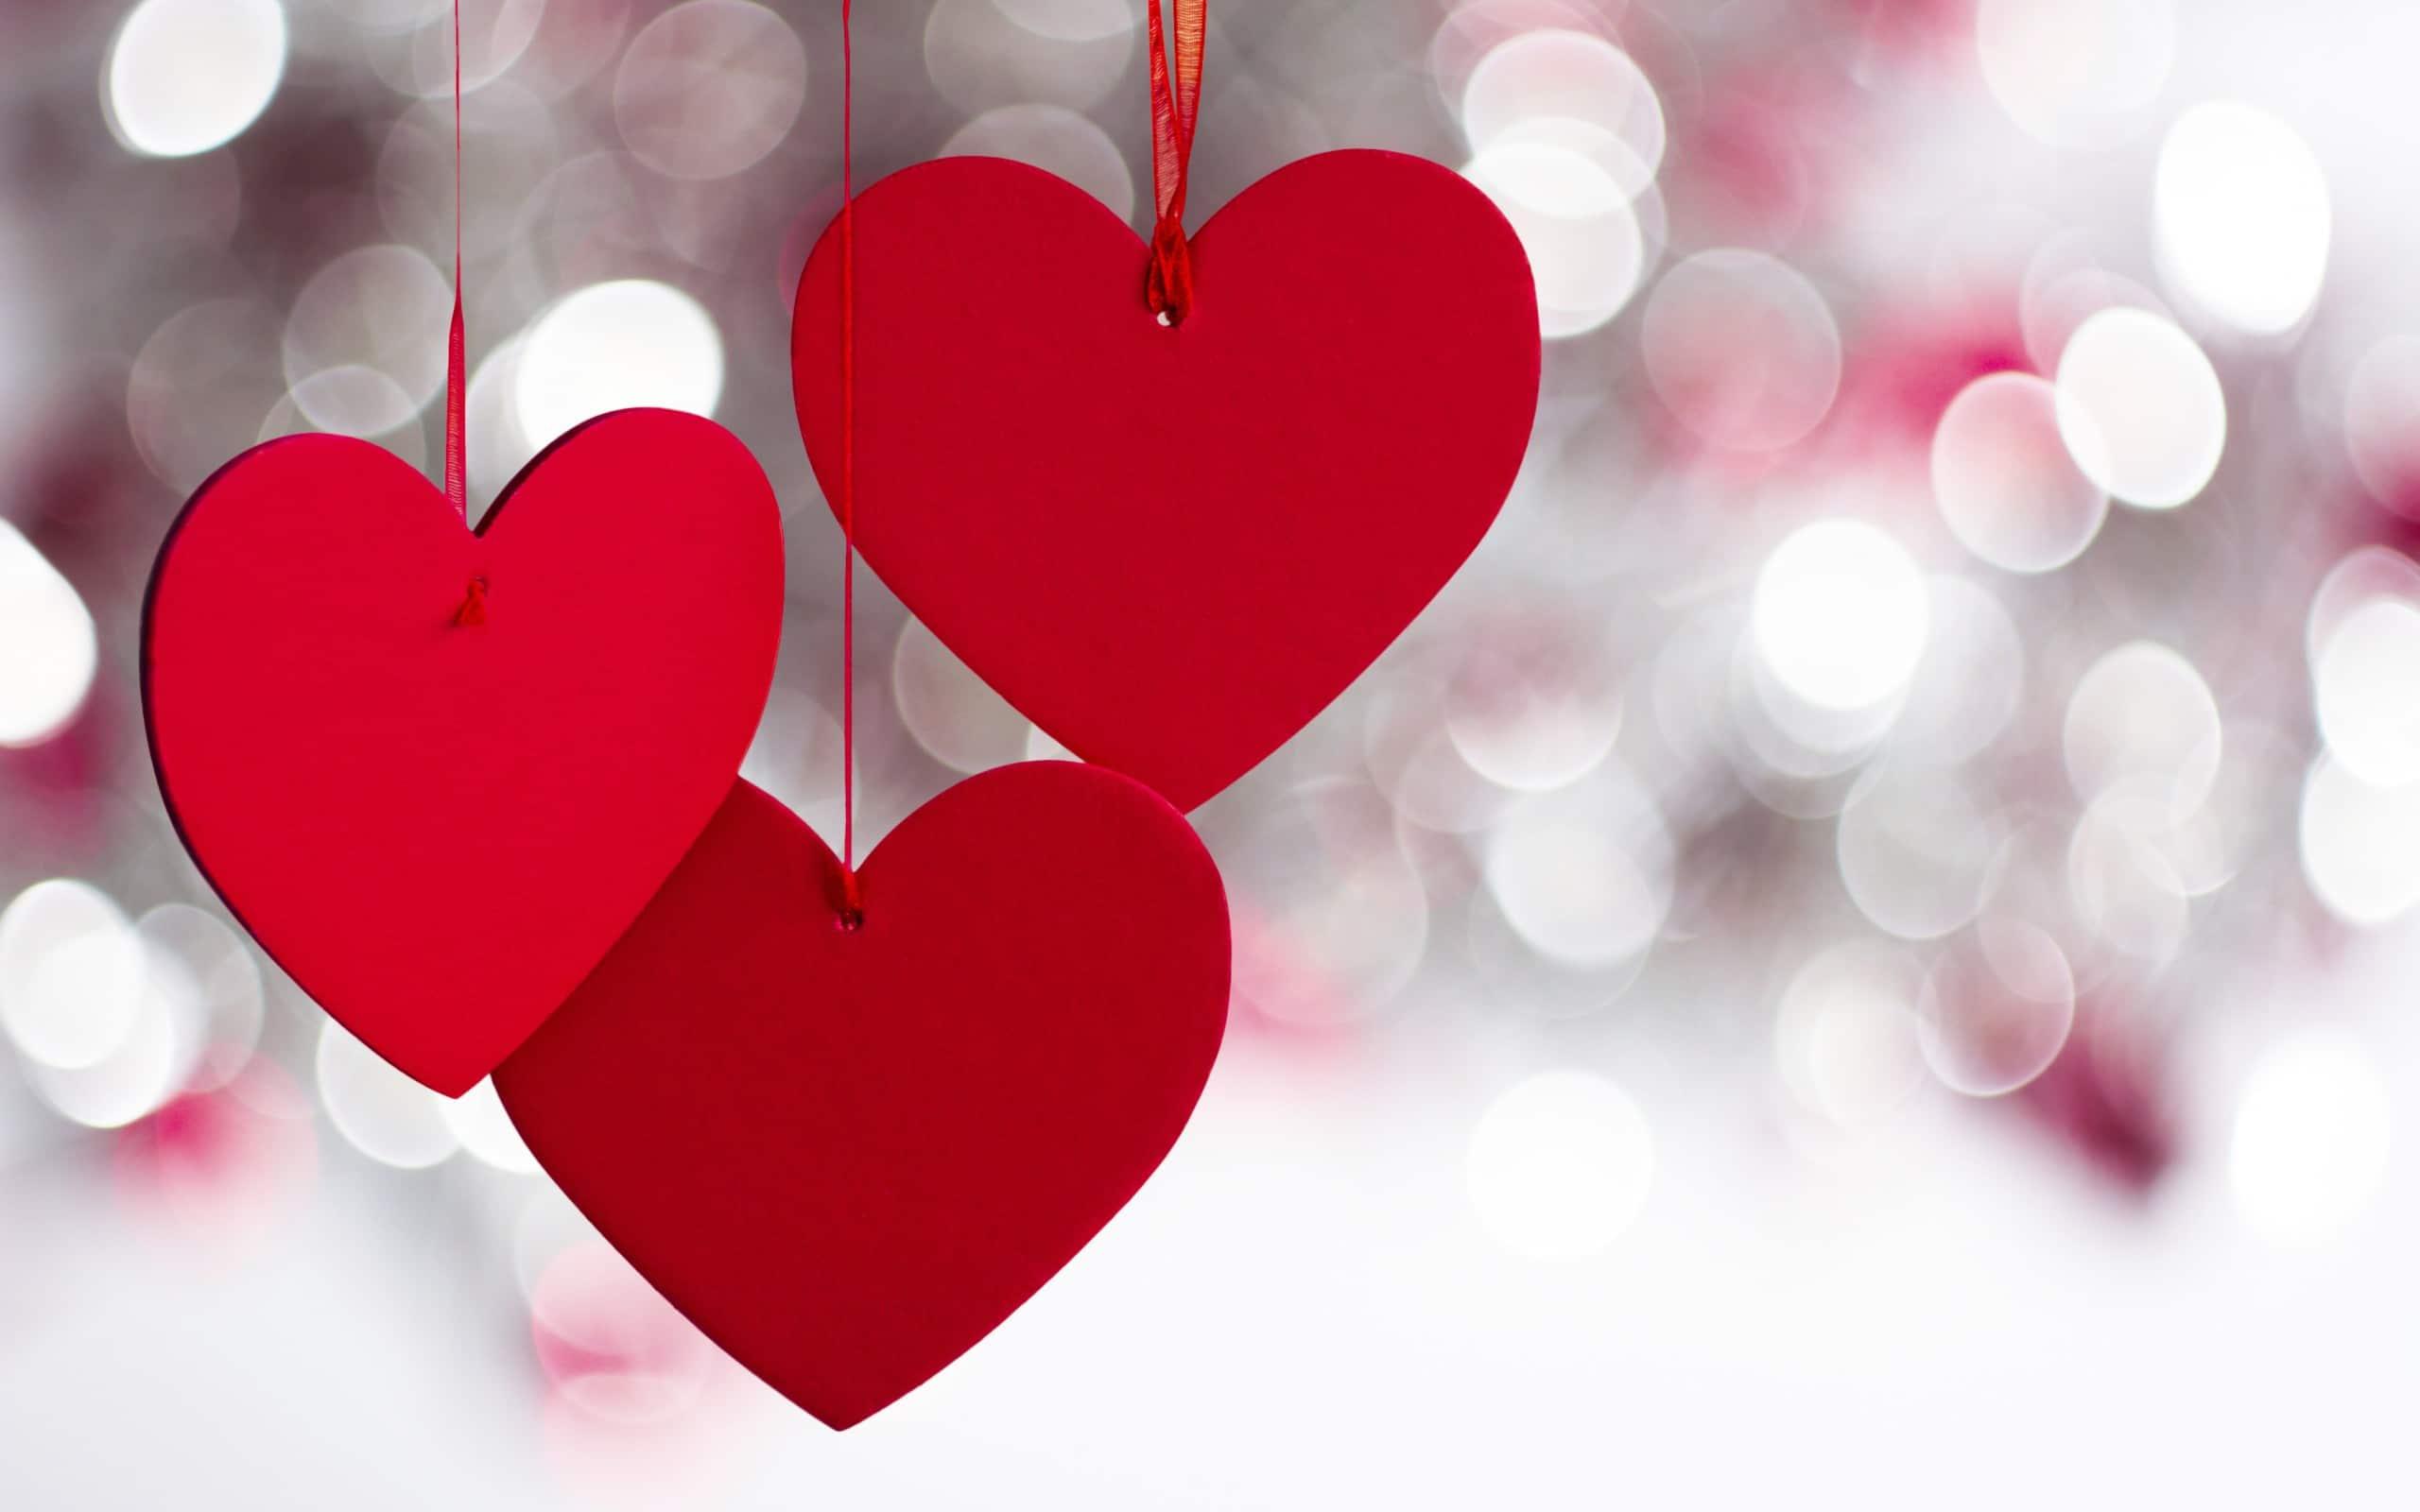 Valentine Heart Desktop Wallpapers Top Free Valentine